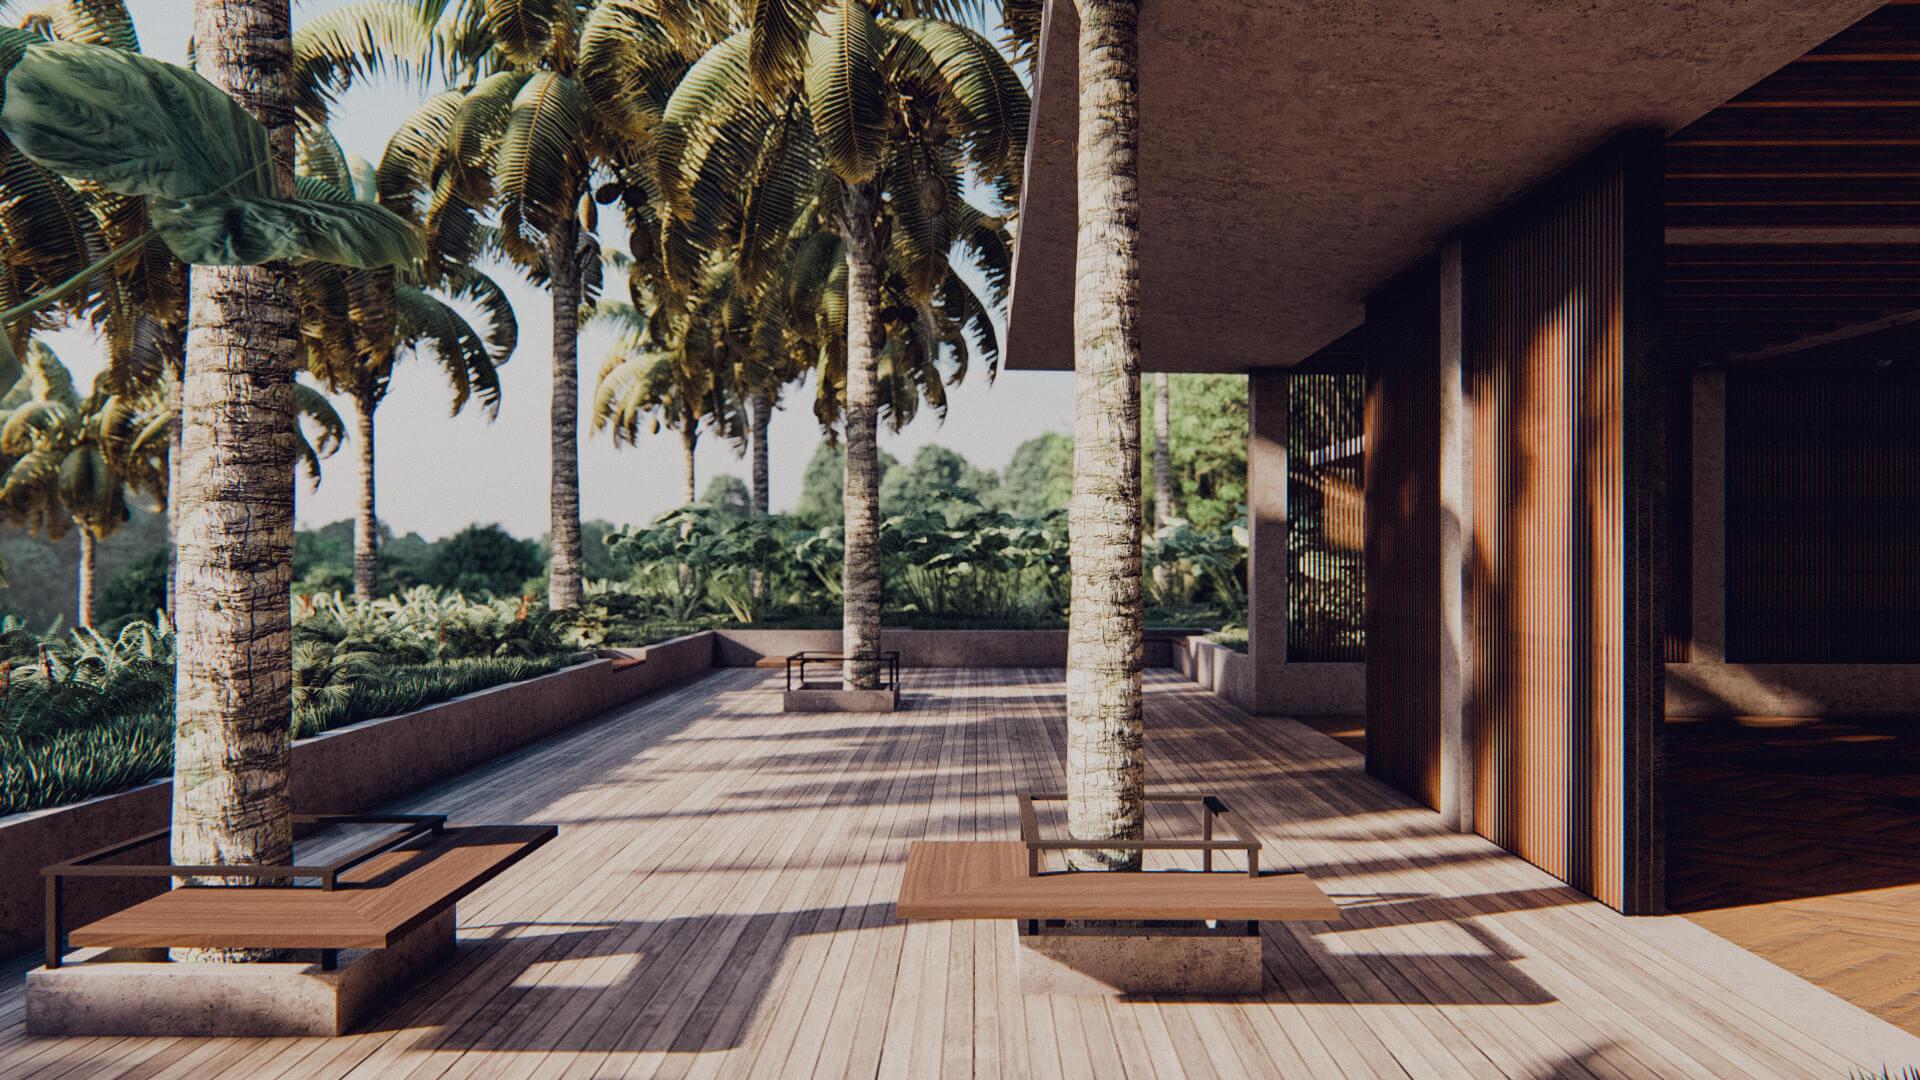 Resort Hotel Yoga Deck Lombok Bali Architect 01